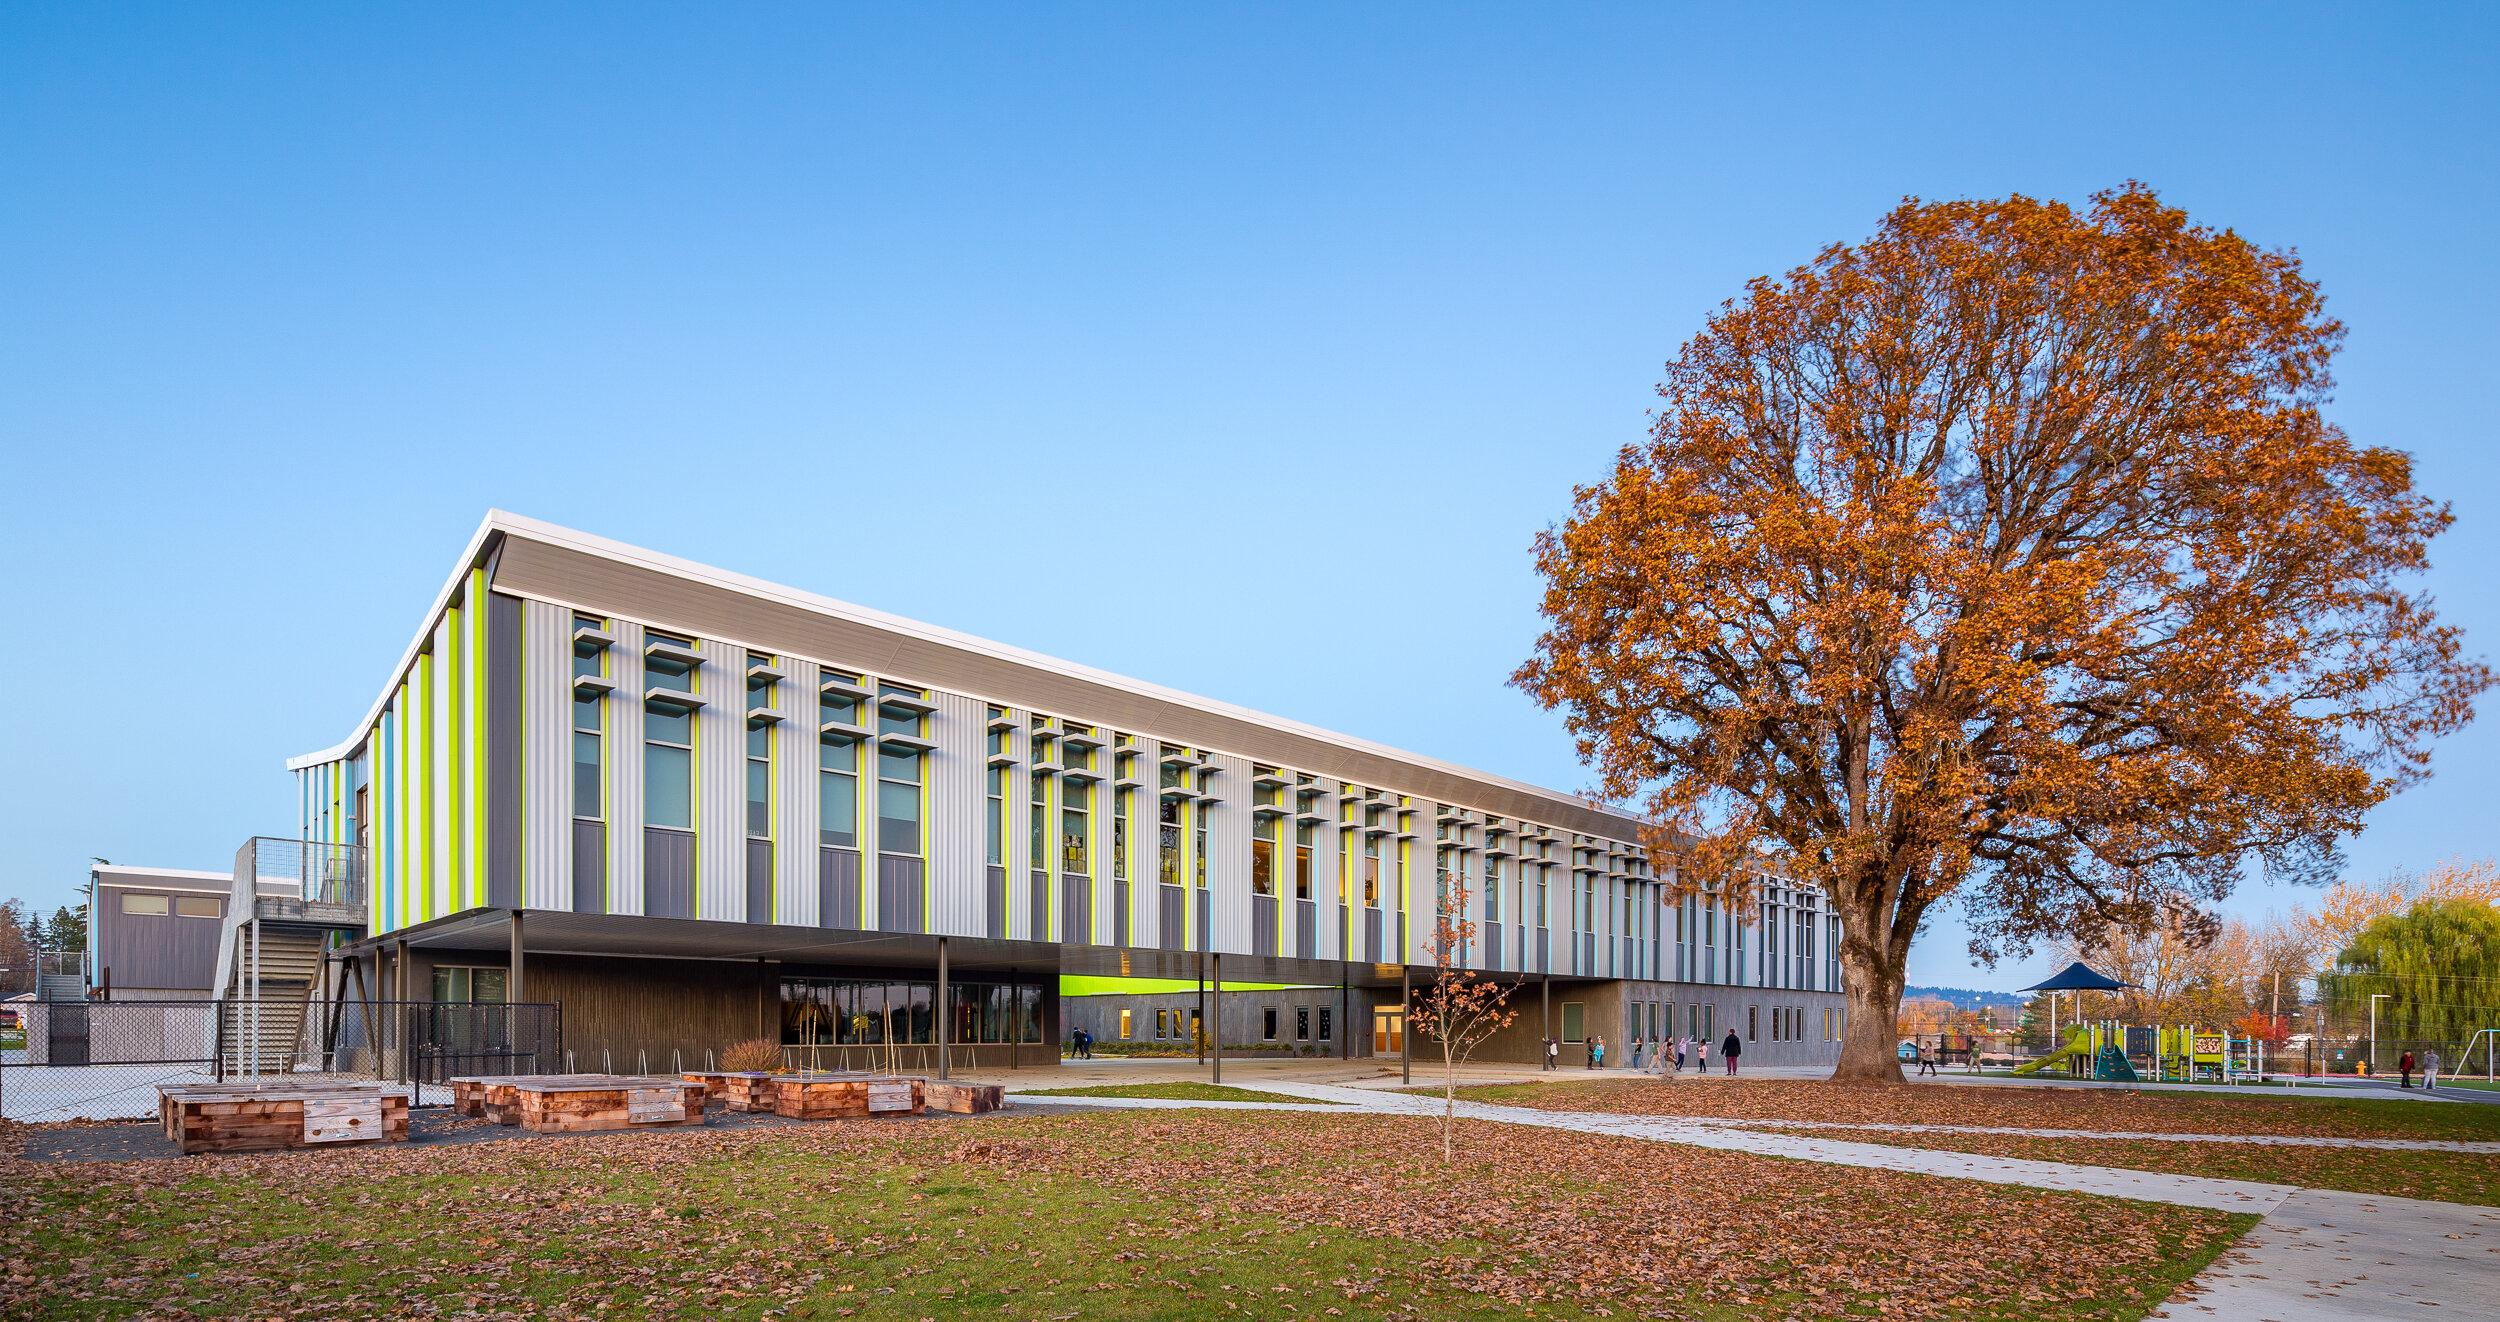 Vose Elementary School / DLR Group + Triplett Wellman